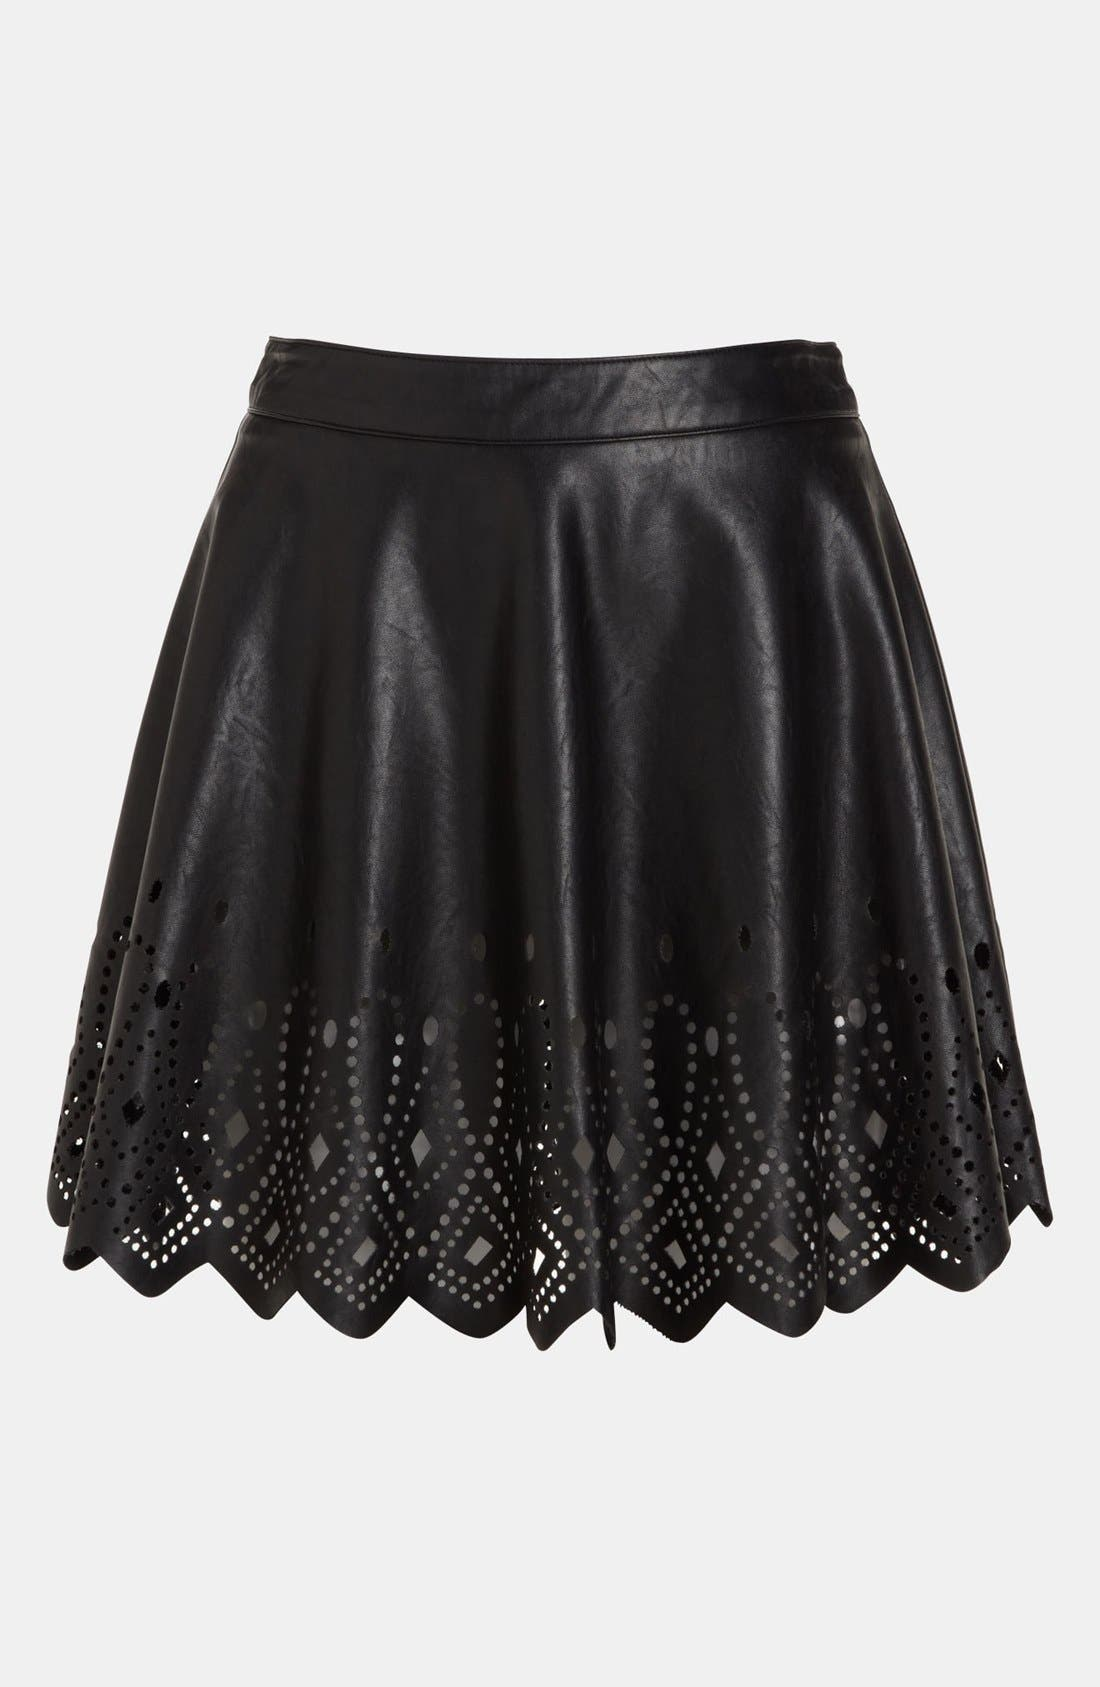 ASTR THE LABEL,                             ASTR Cutout Faux Leather Skirt,                             Alternate thumbnail 3, color,                             001